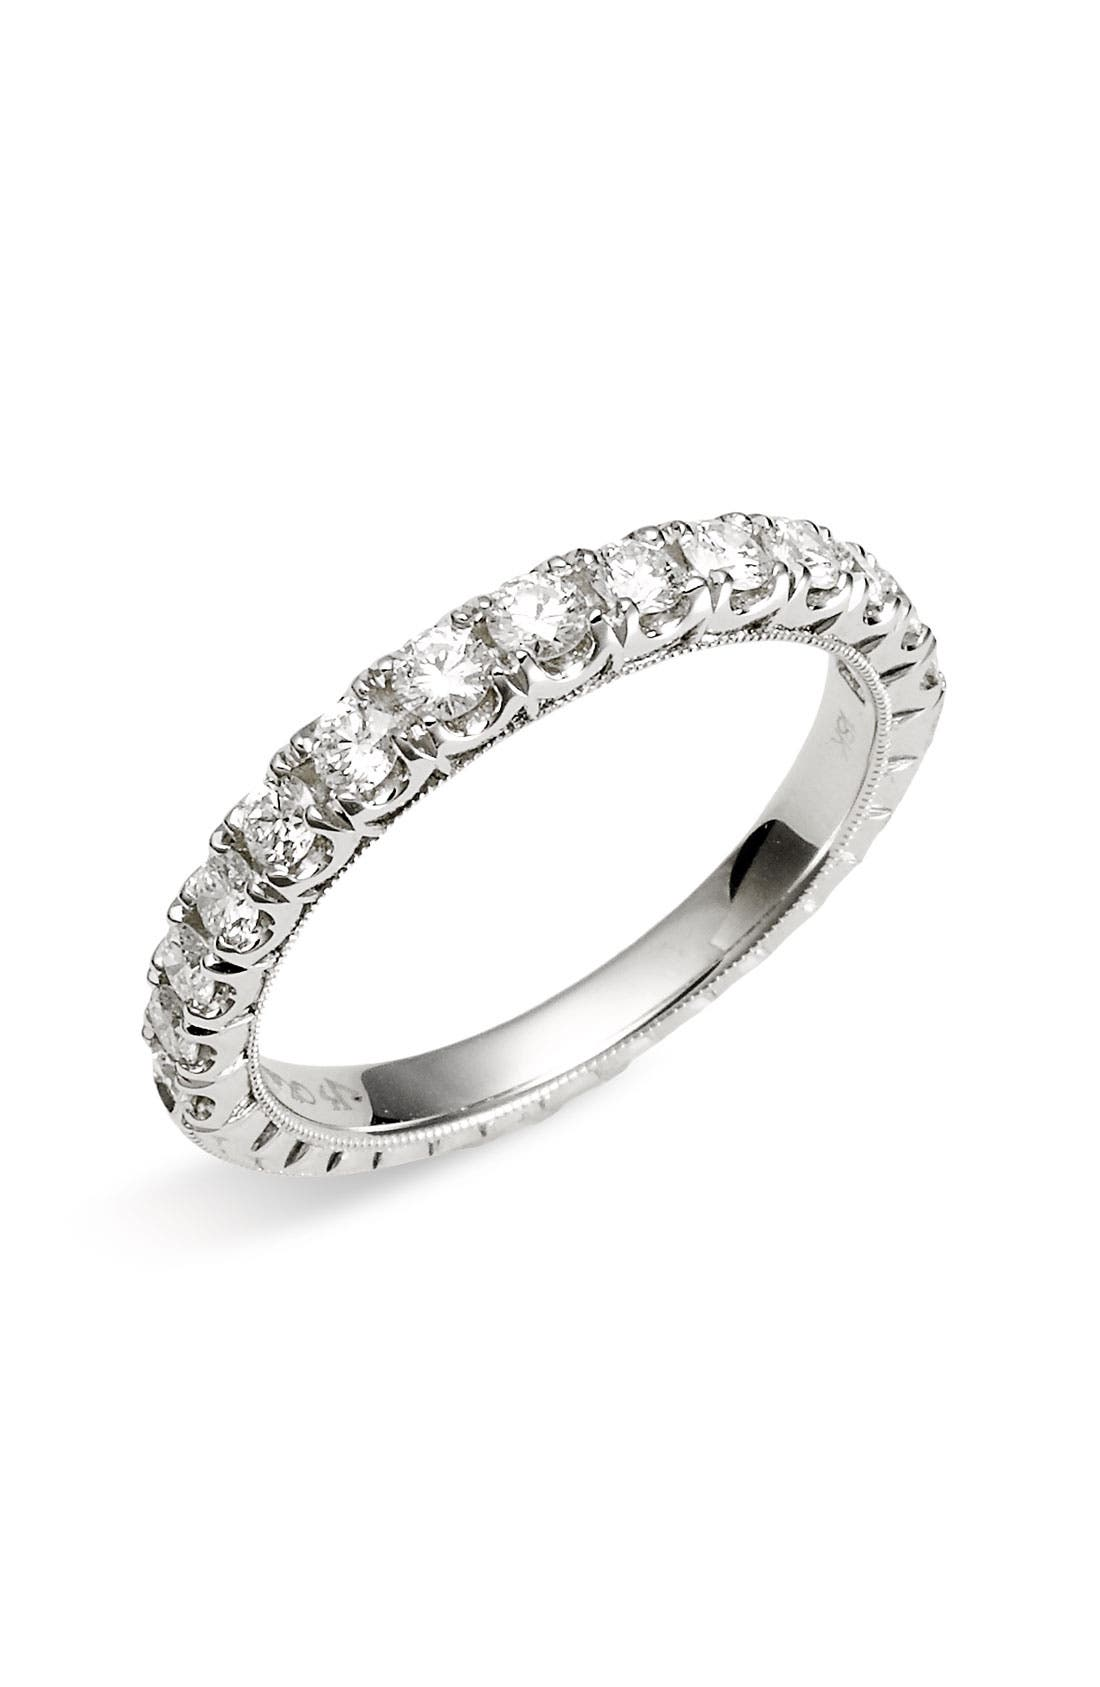 Alternate Image 1 Selected - Jack Kelége 'Romance' Diamond Ring